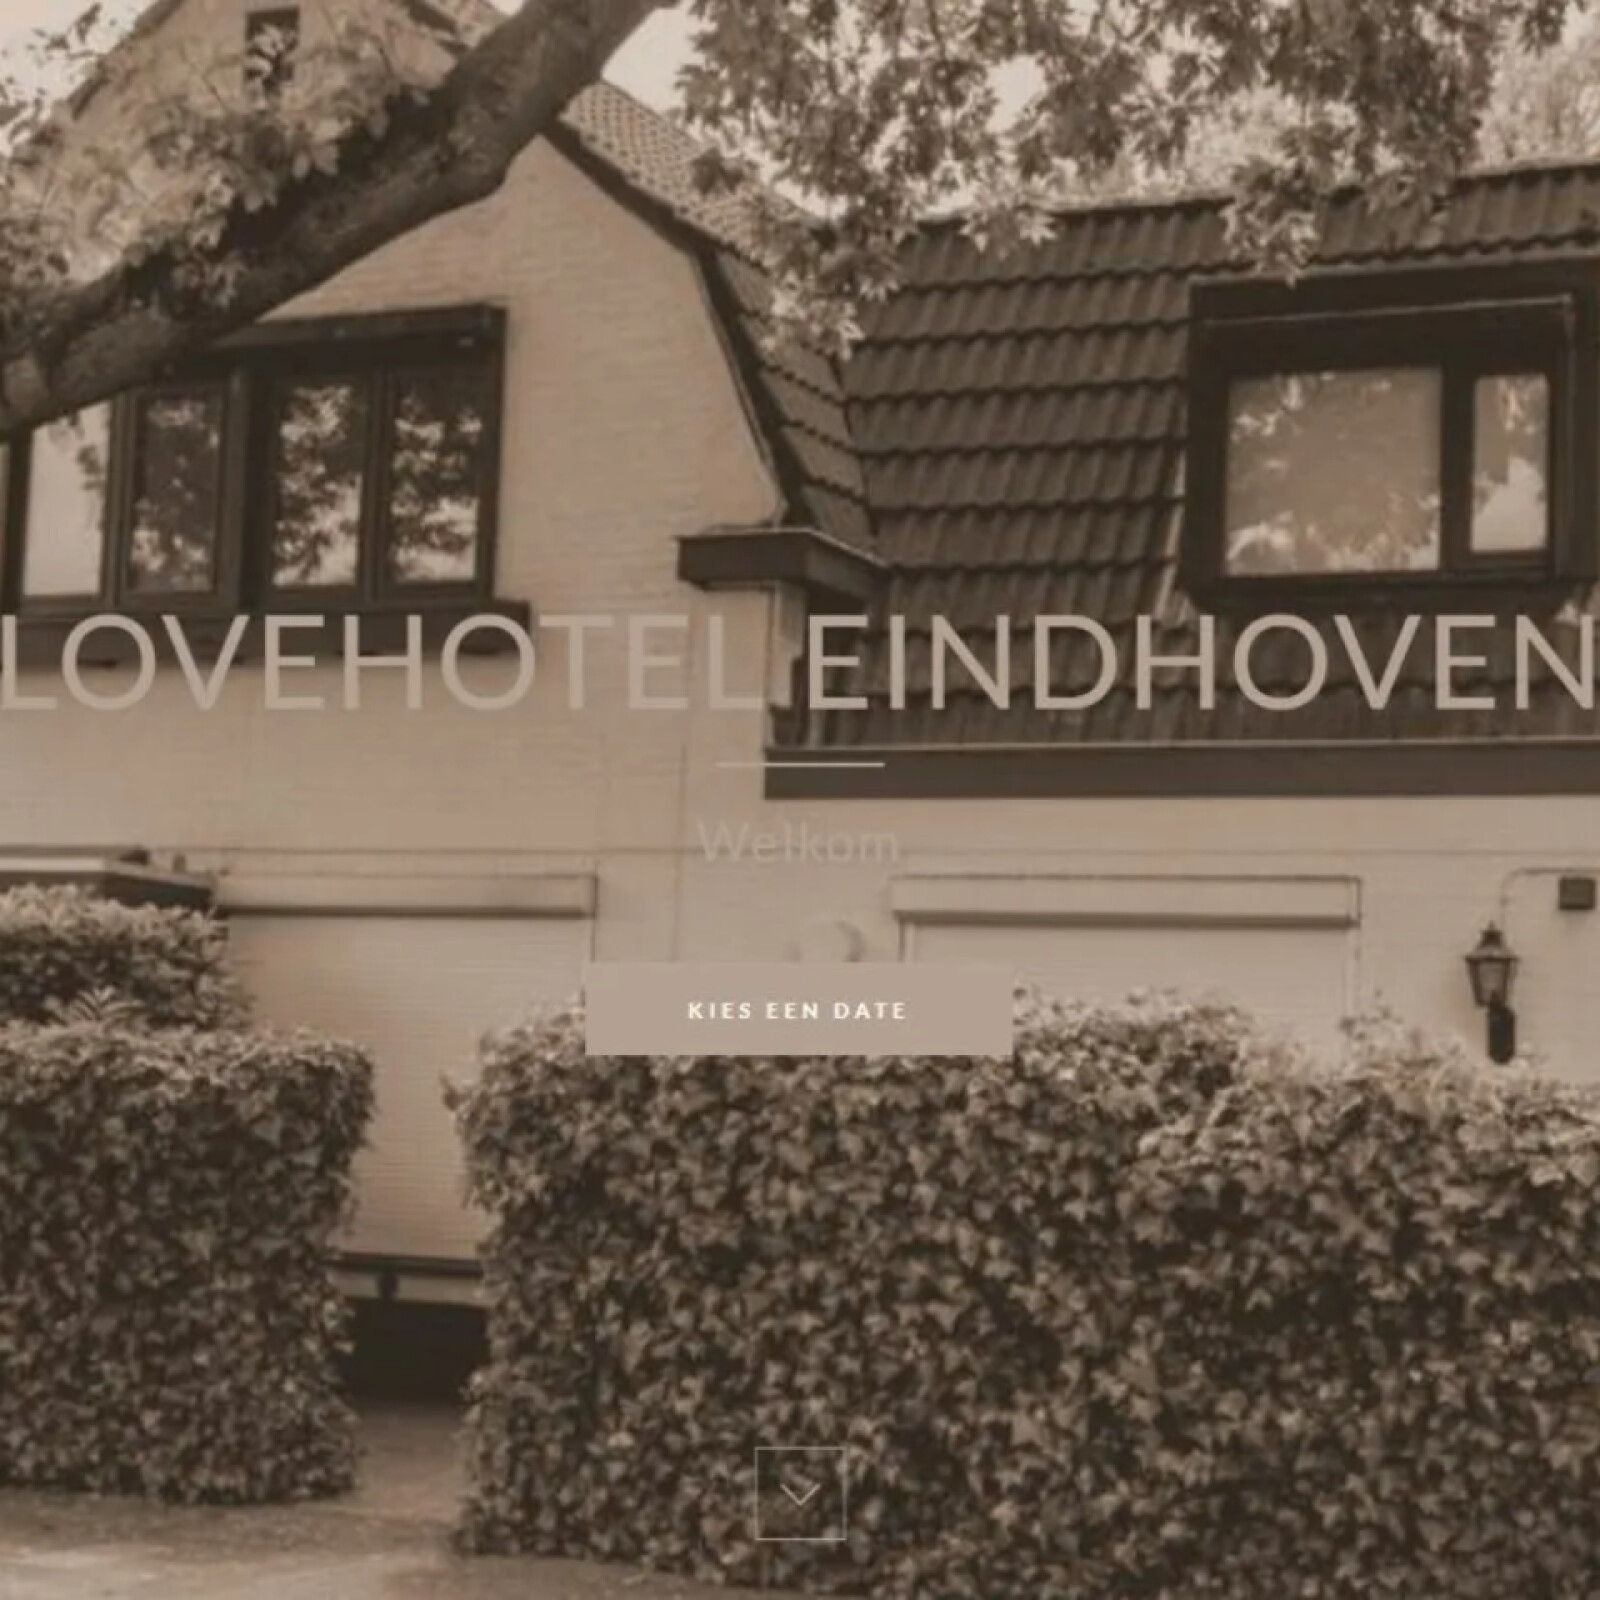 lovehotel-eindhoven